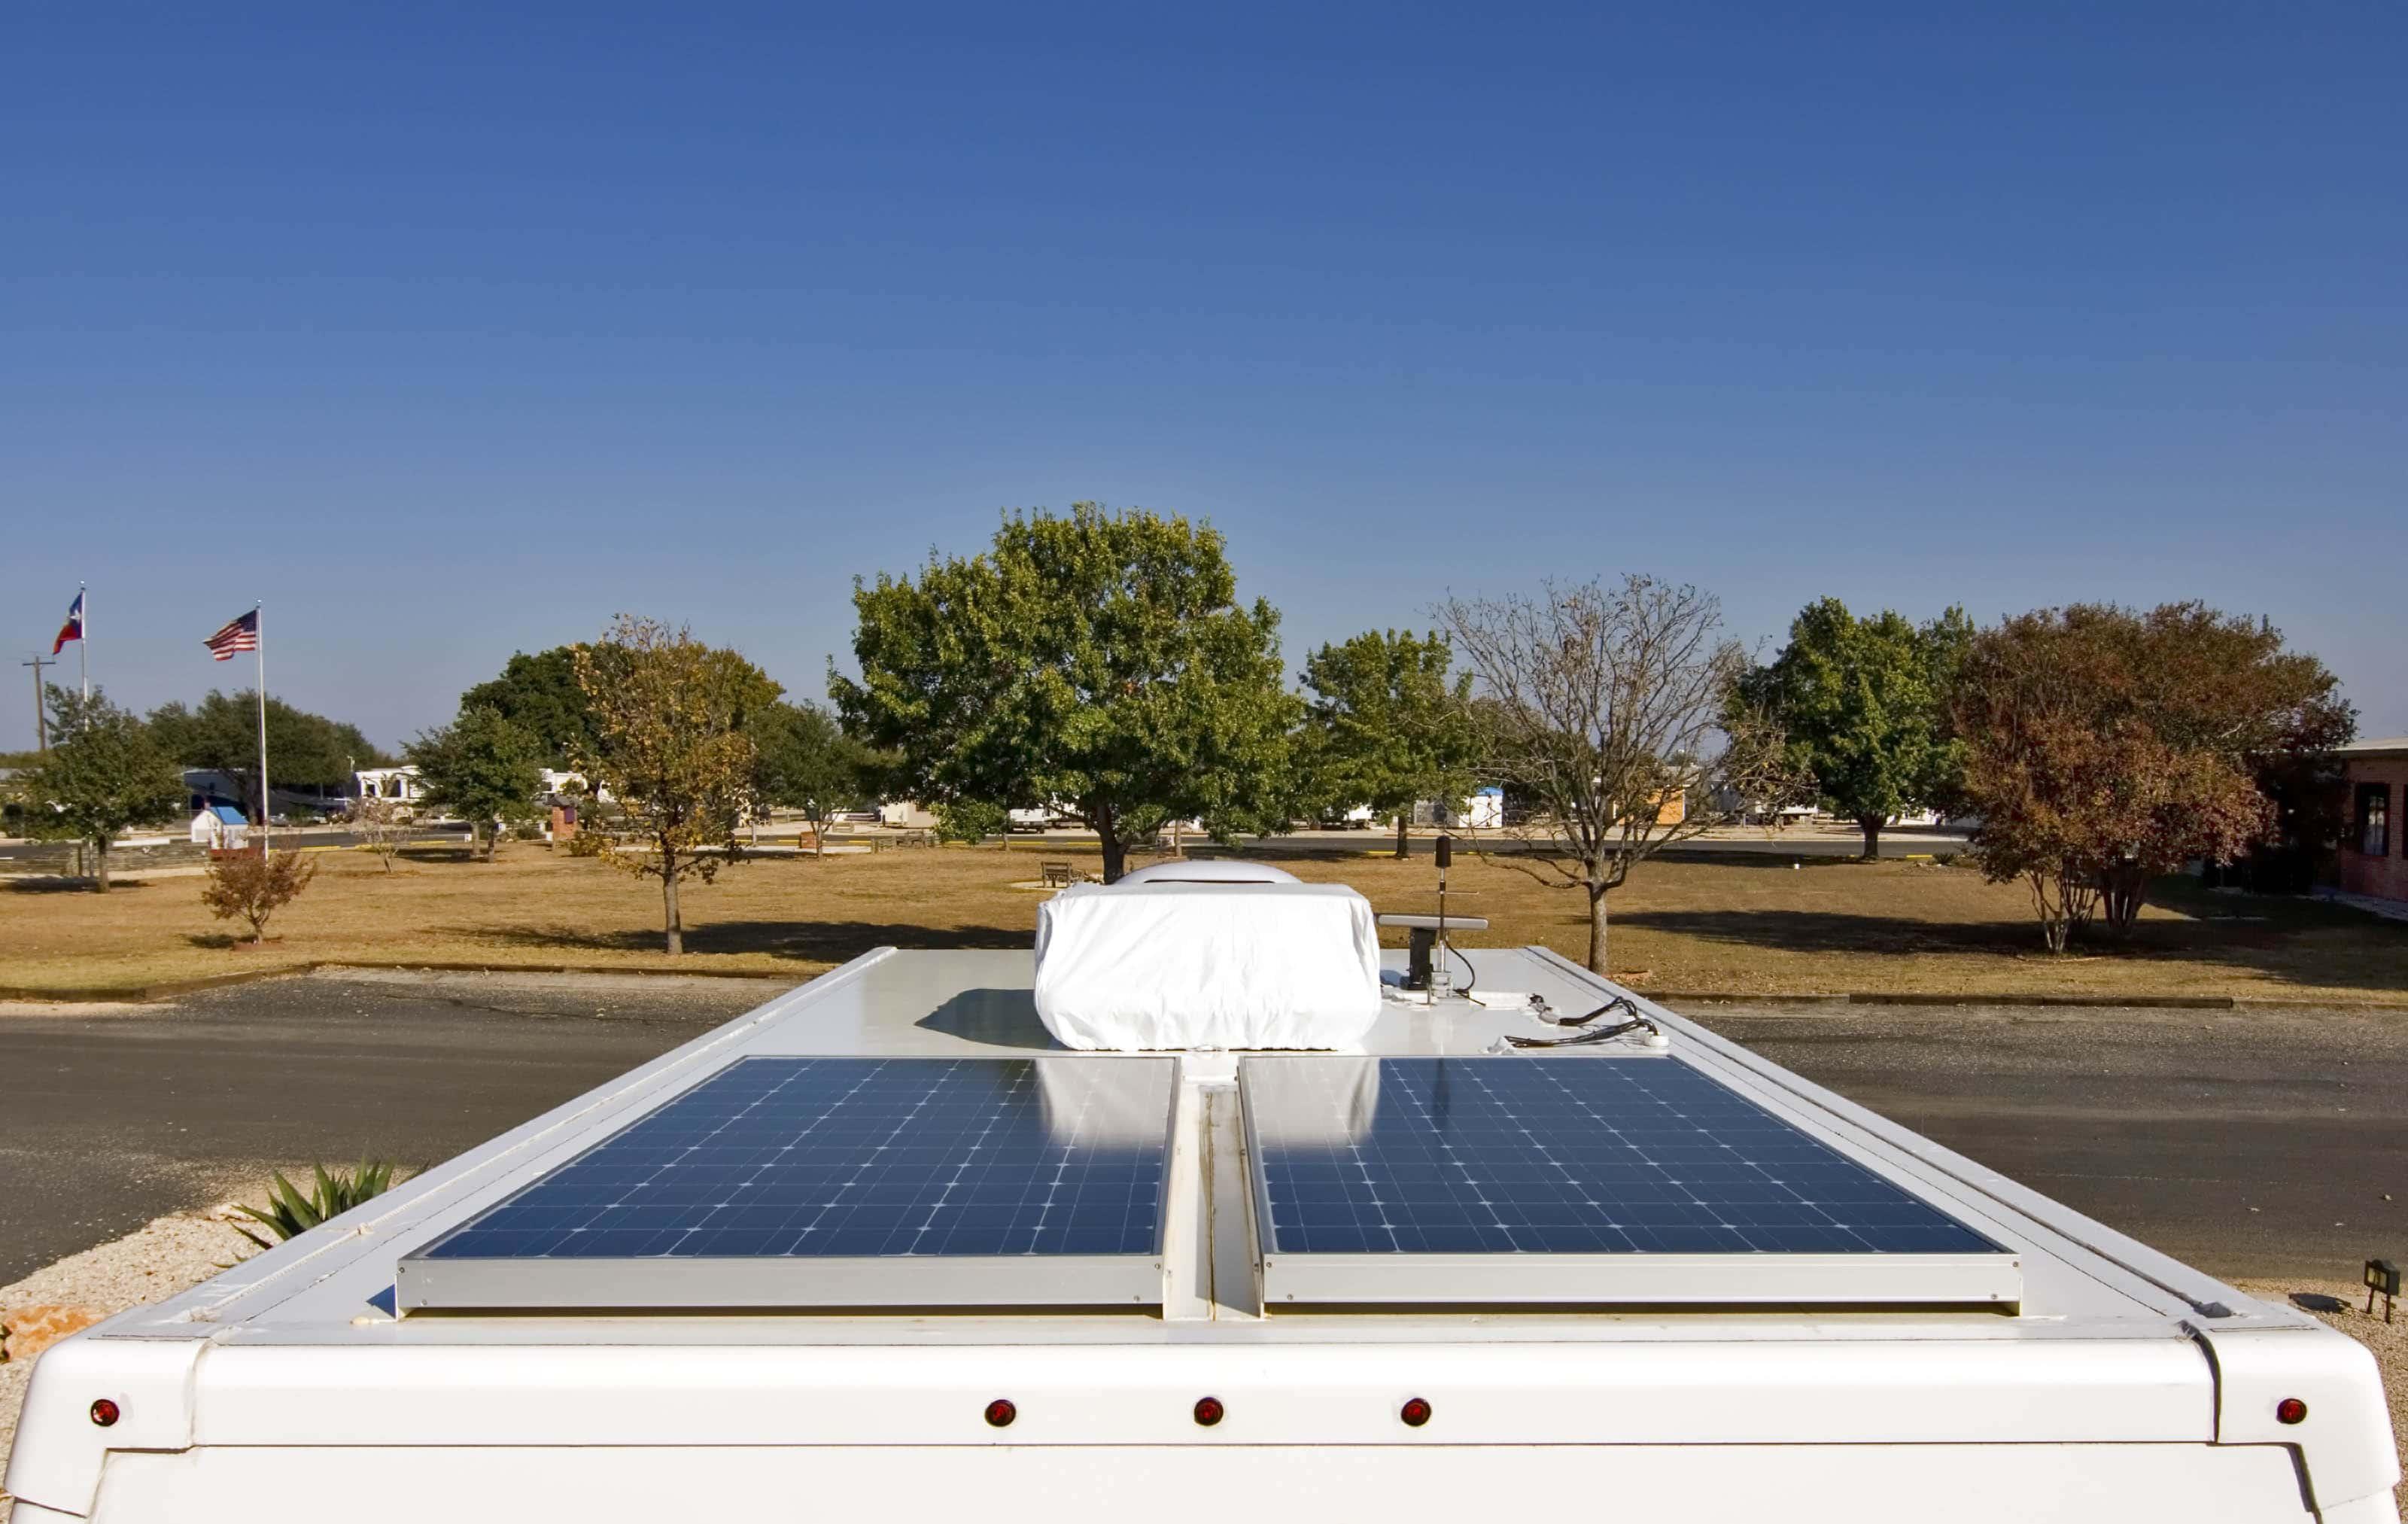 rv solar 2004 dodge 2 7 engine diagram panels clean energy ideas